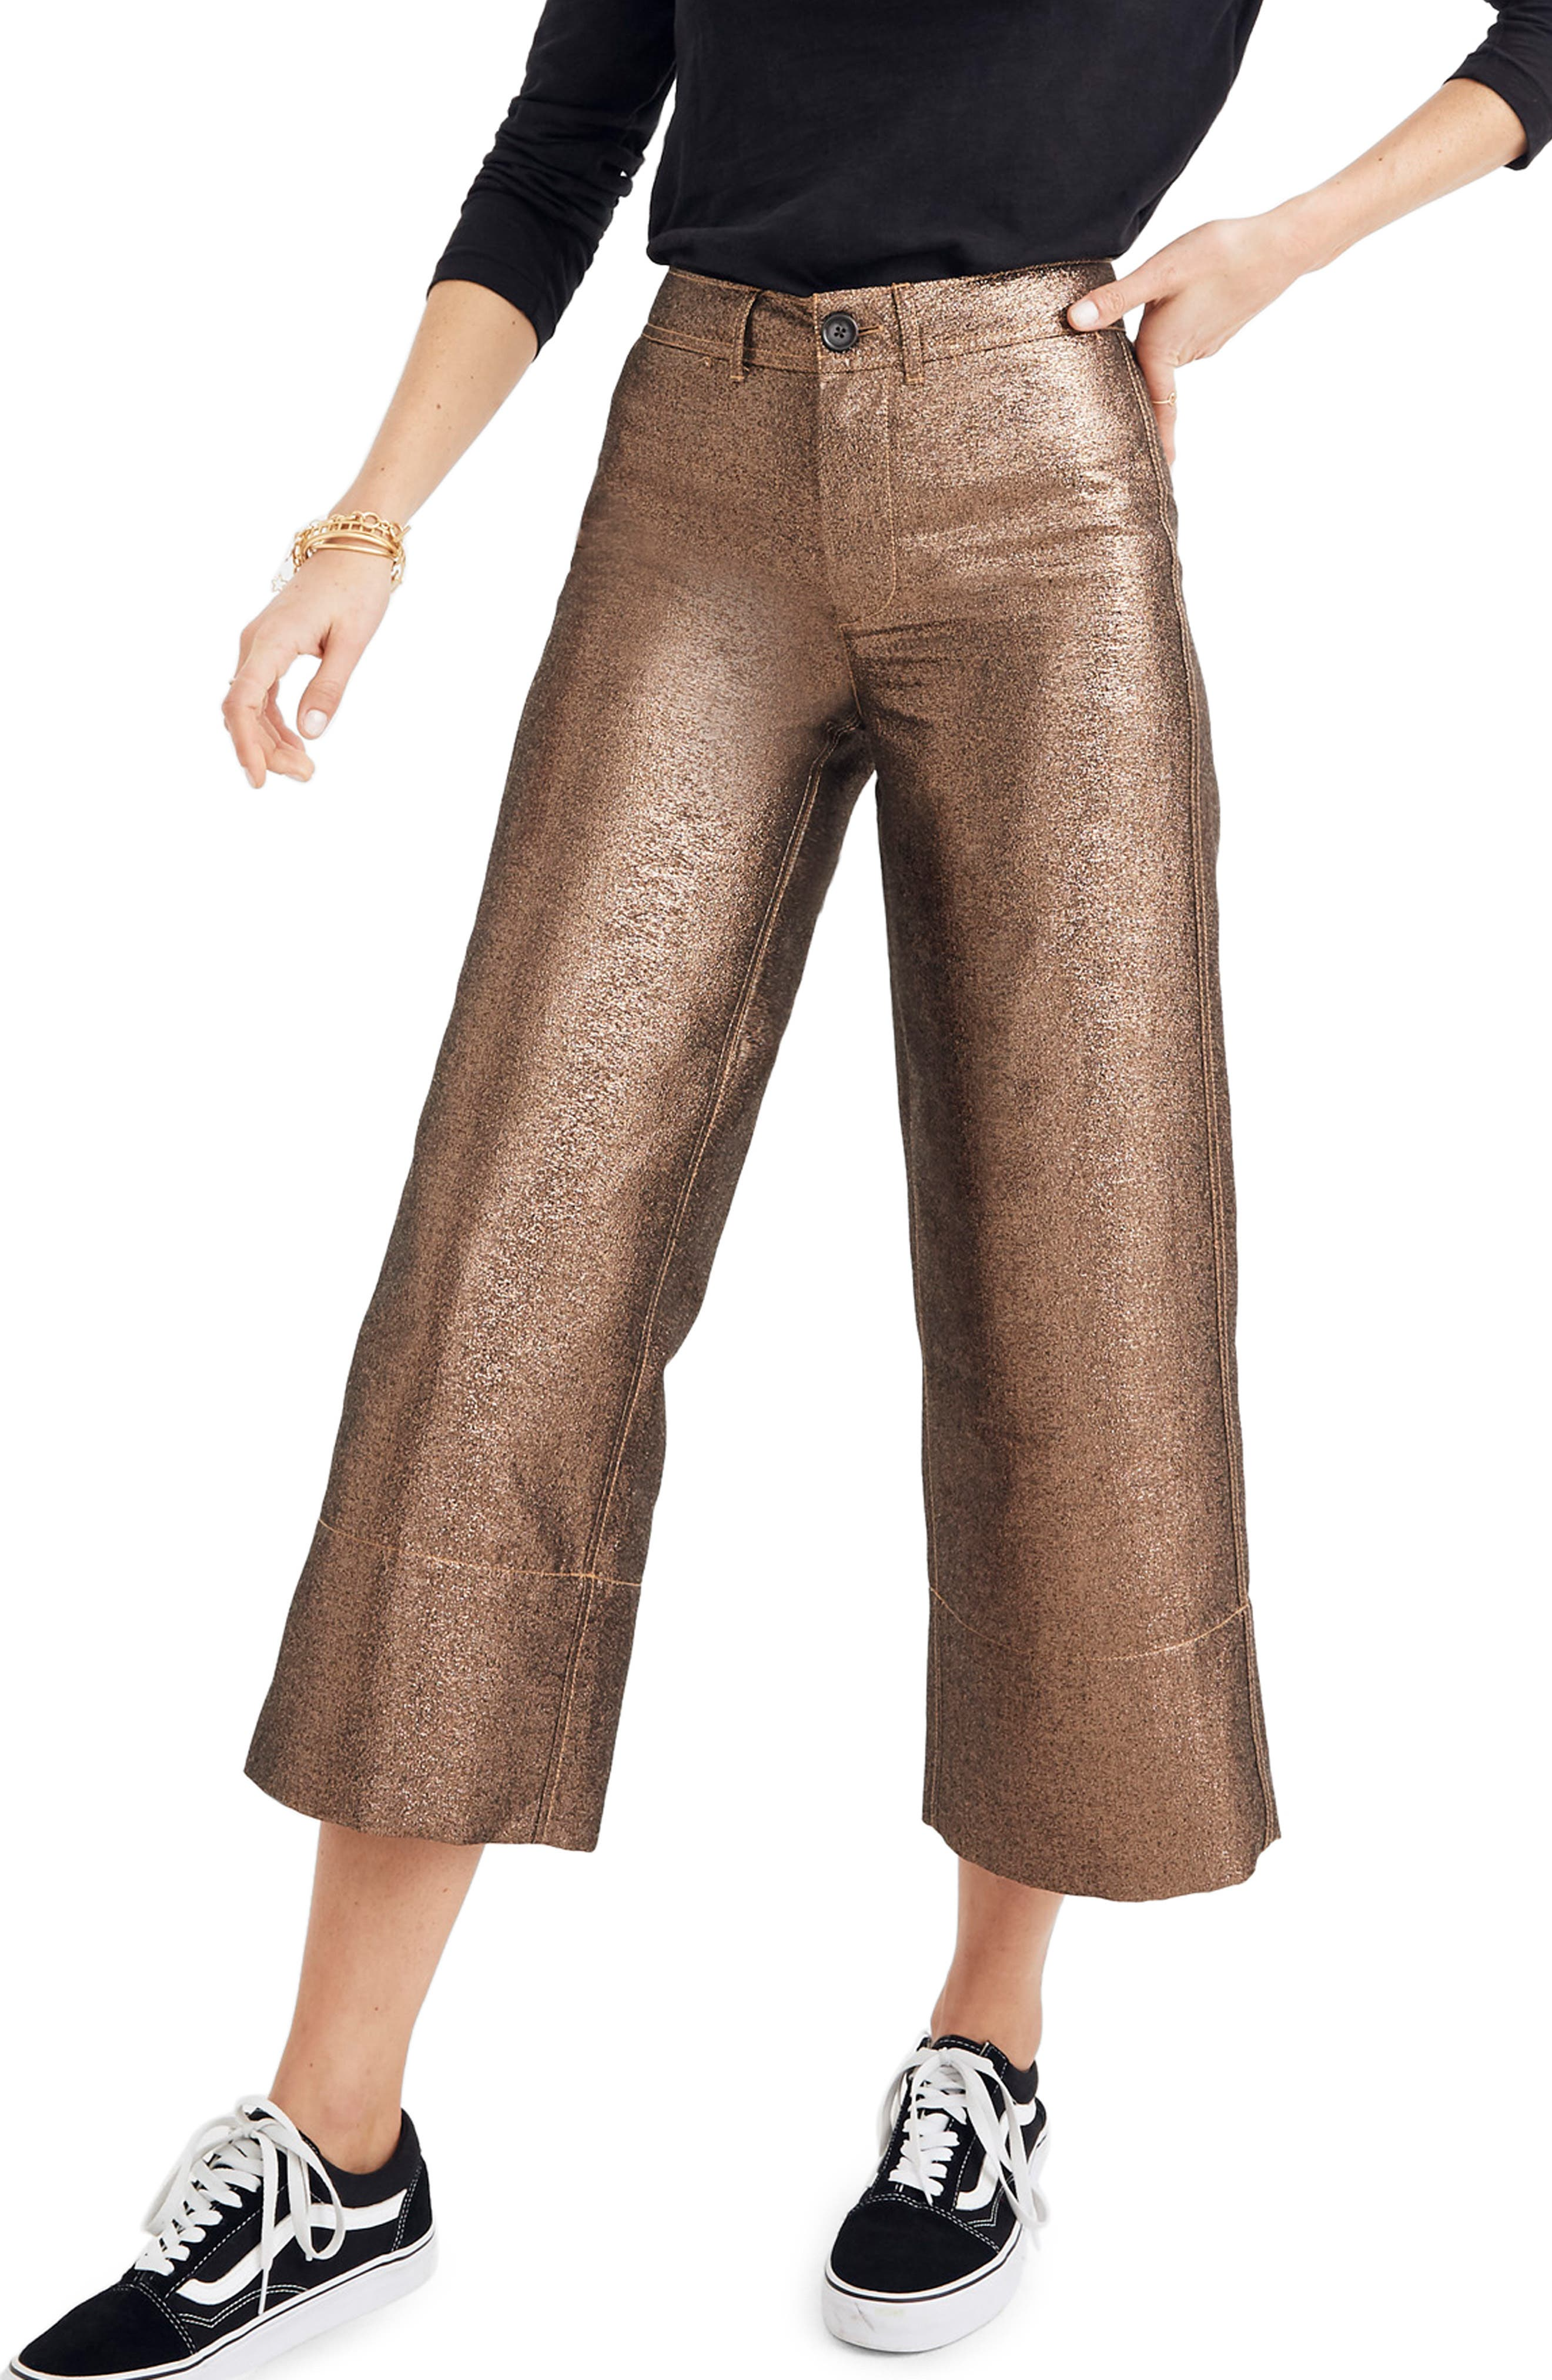 Langford Metallic Crop Wide Leg Pants,                             Main thumbnail 1, color,                             METALLIC SAND